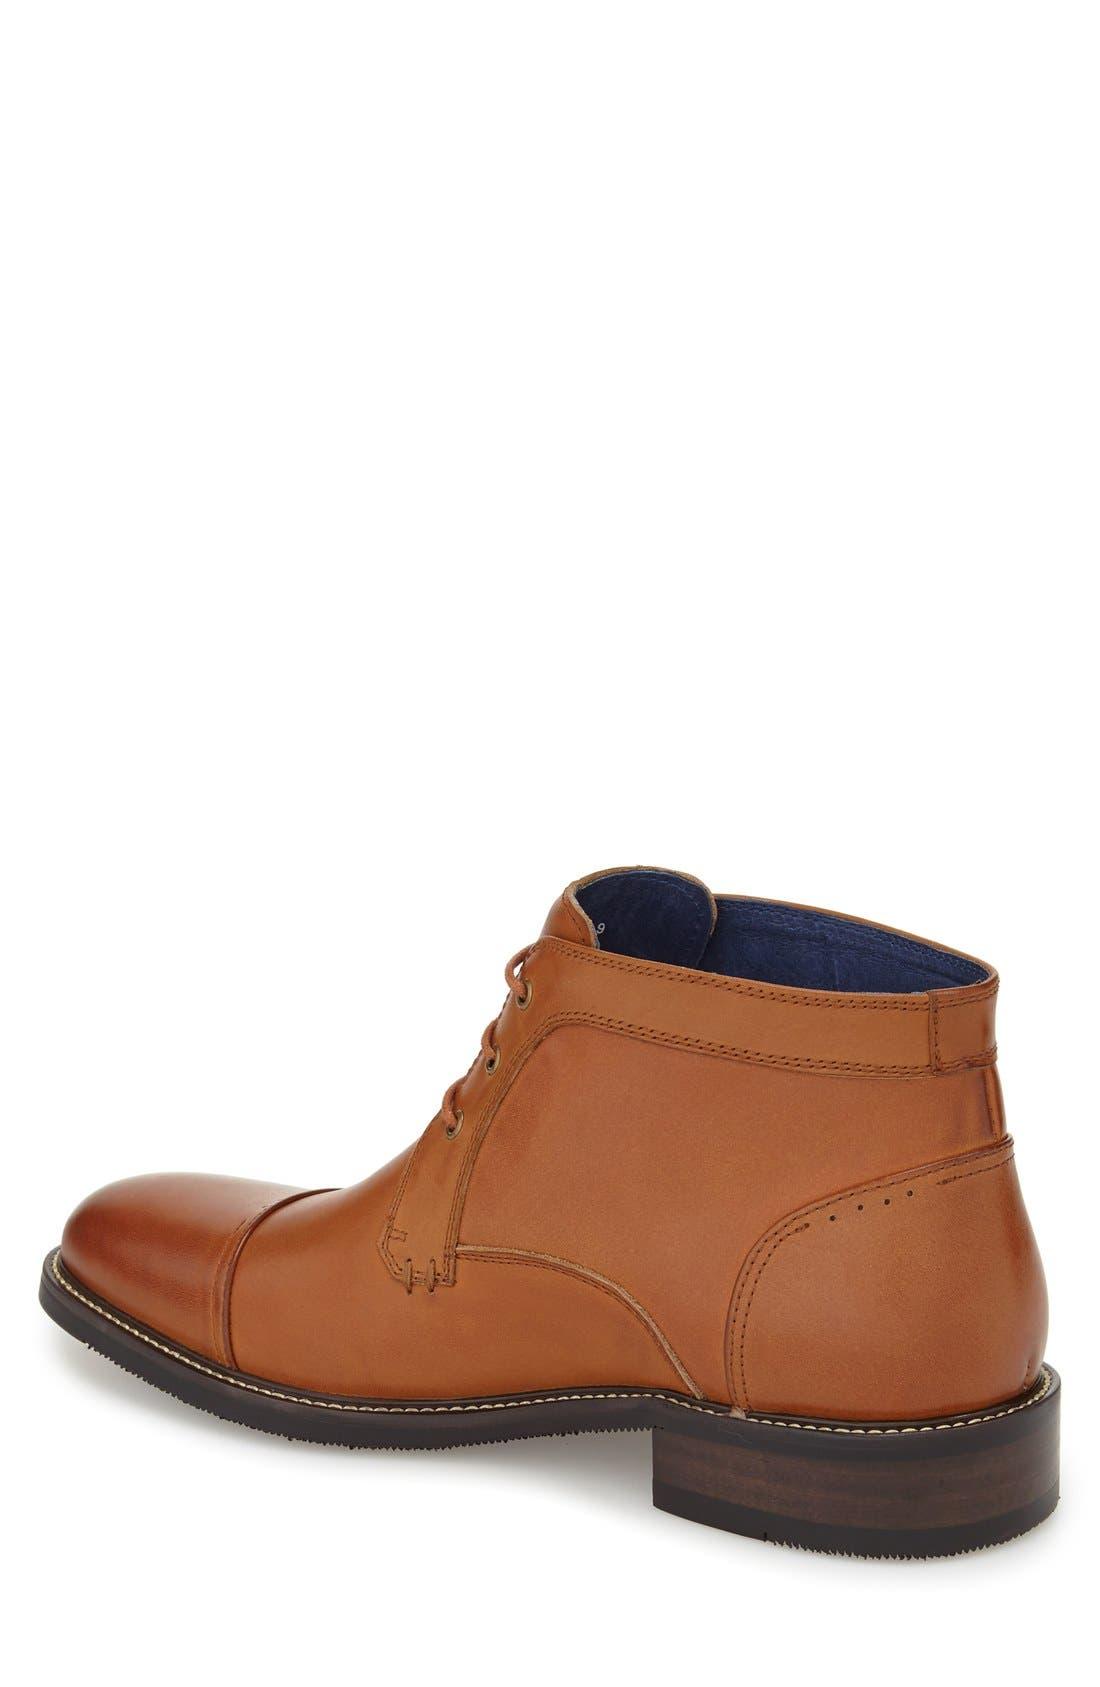 Alternate Image 2  - Zanzara 'Rubano' Chukka Boot (Men)